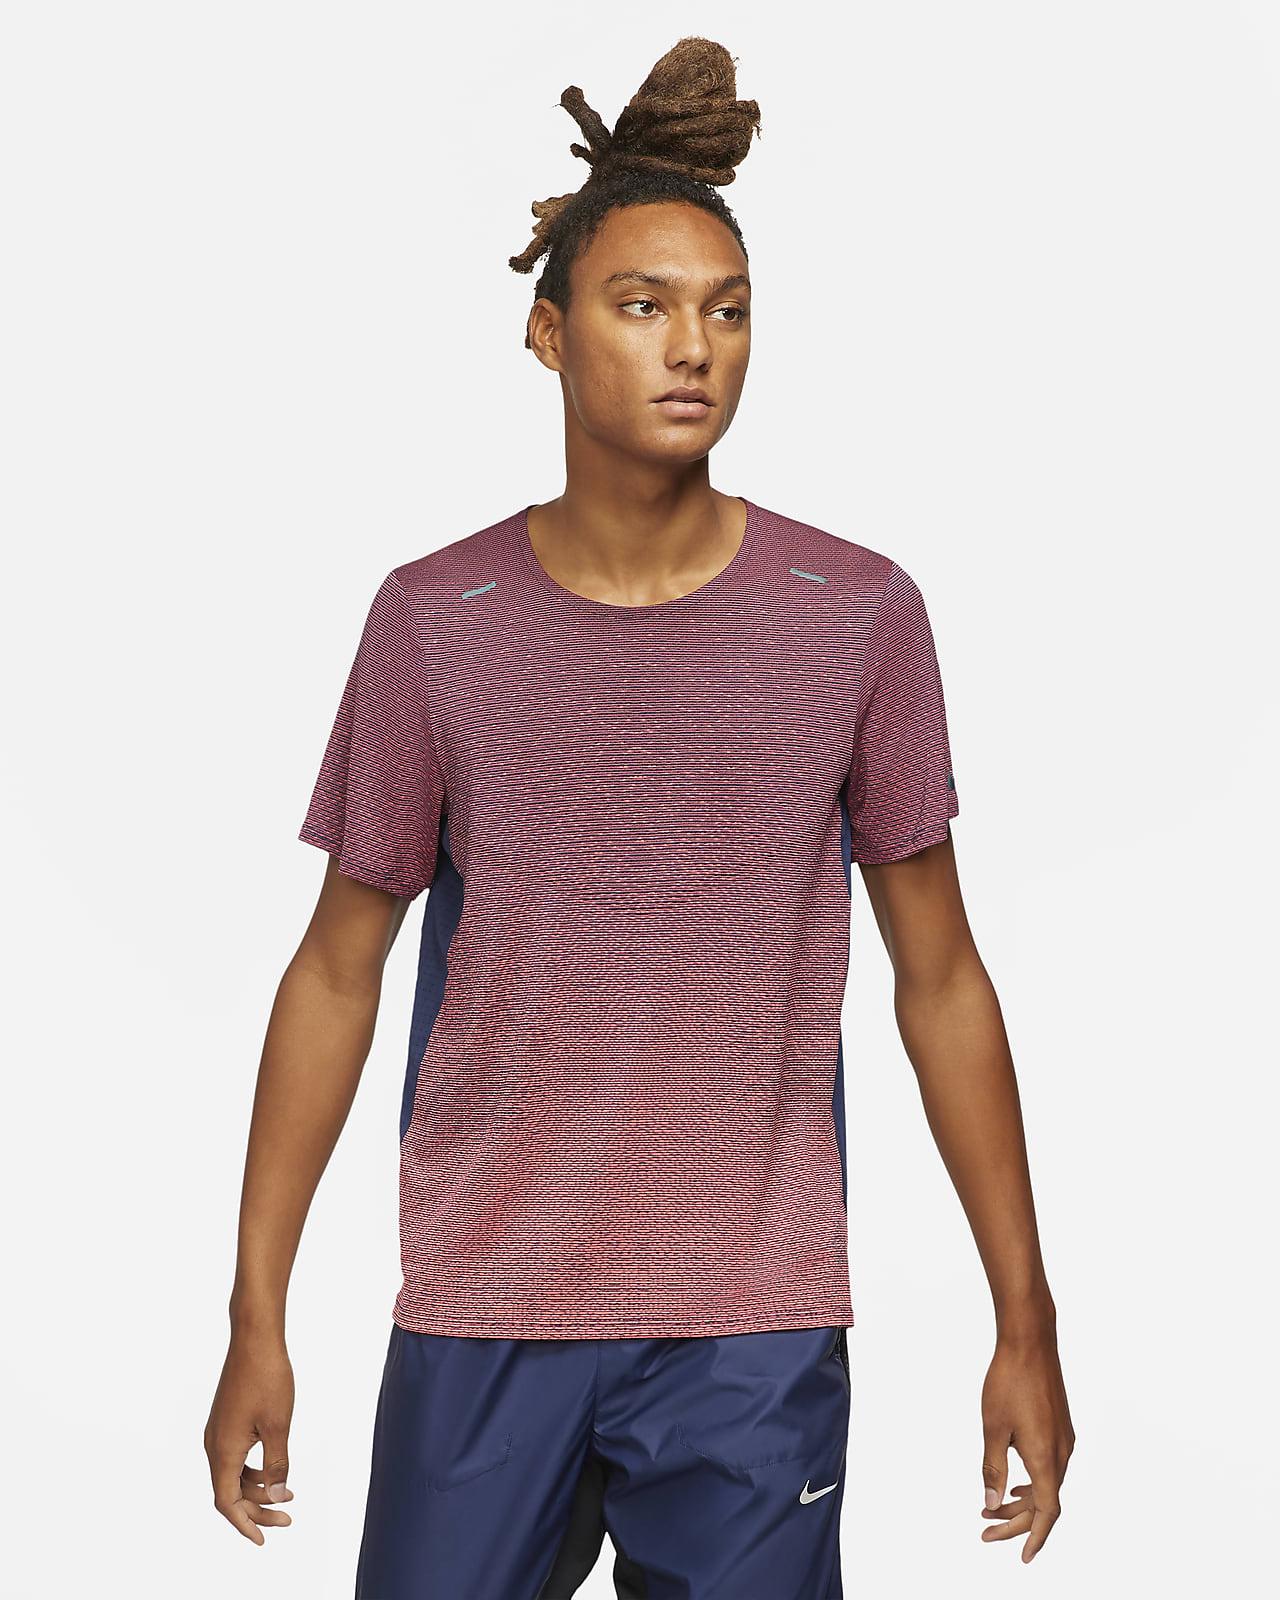 Nike Pinnacle Run Division Camiseta de running de manga corta - Hombre